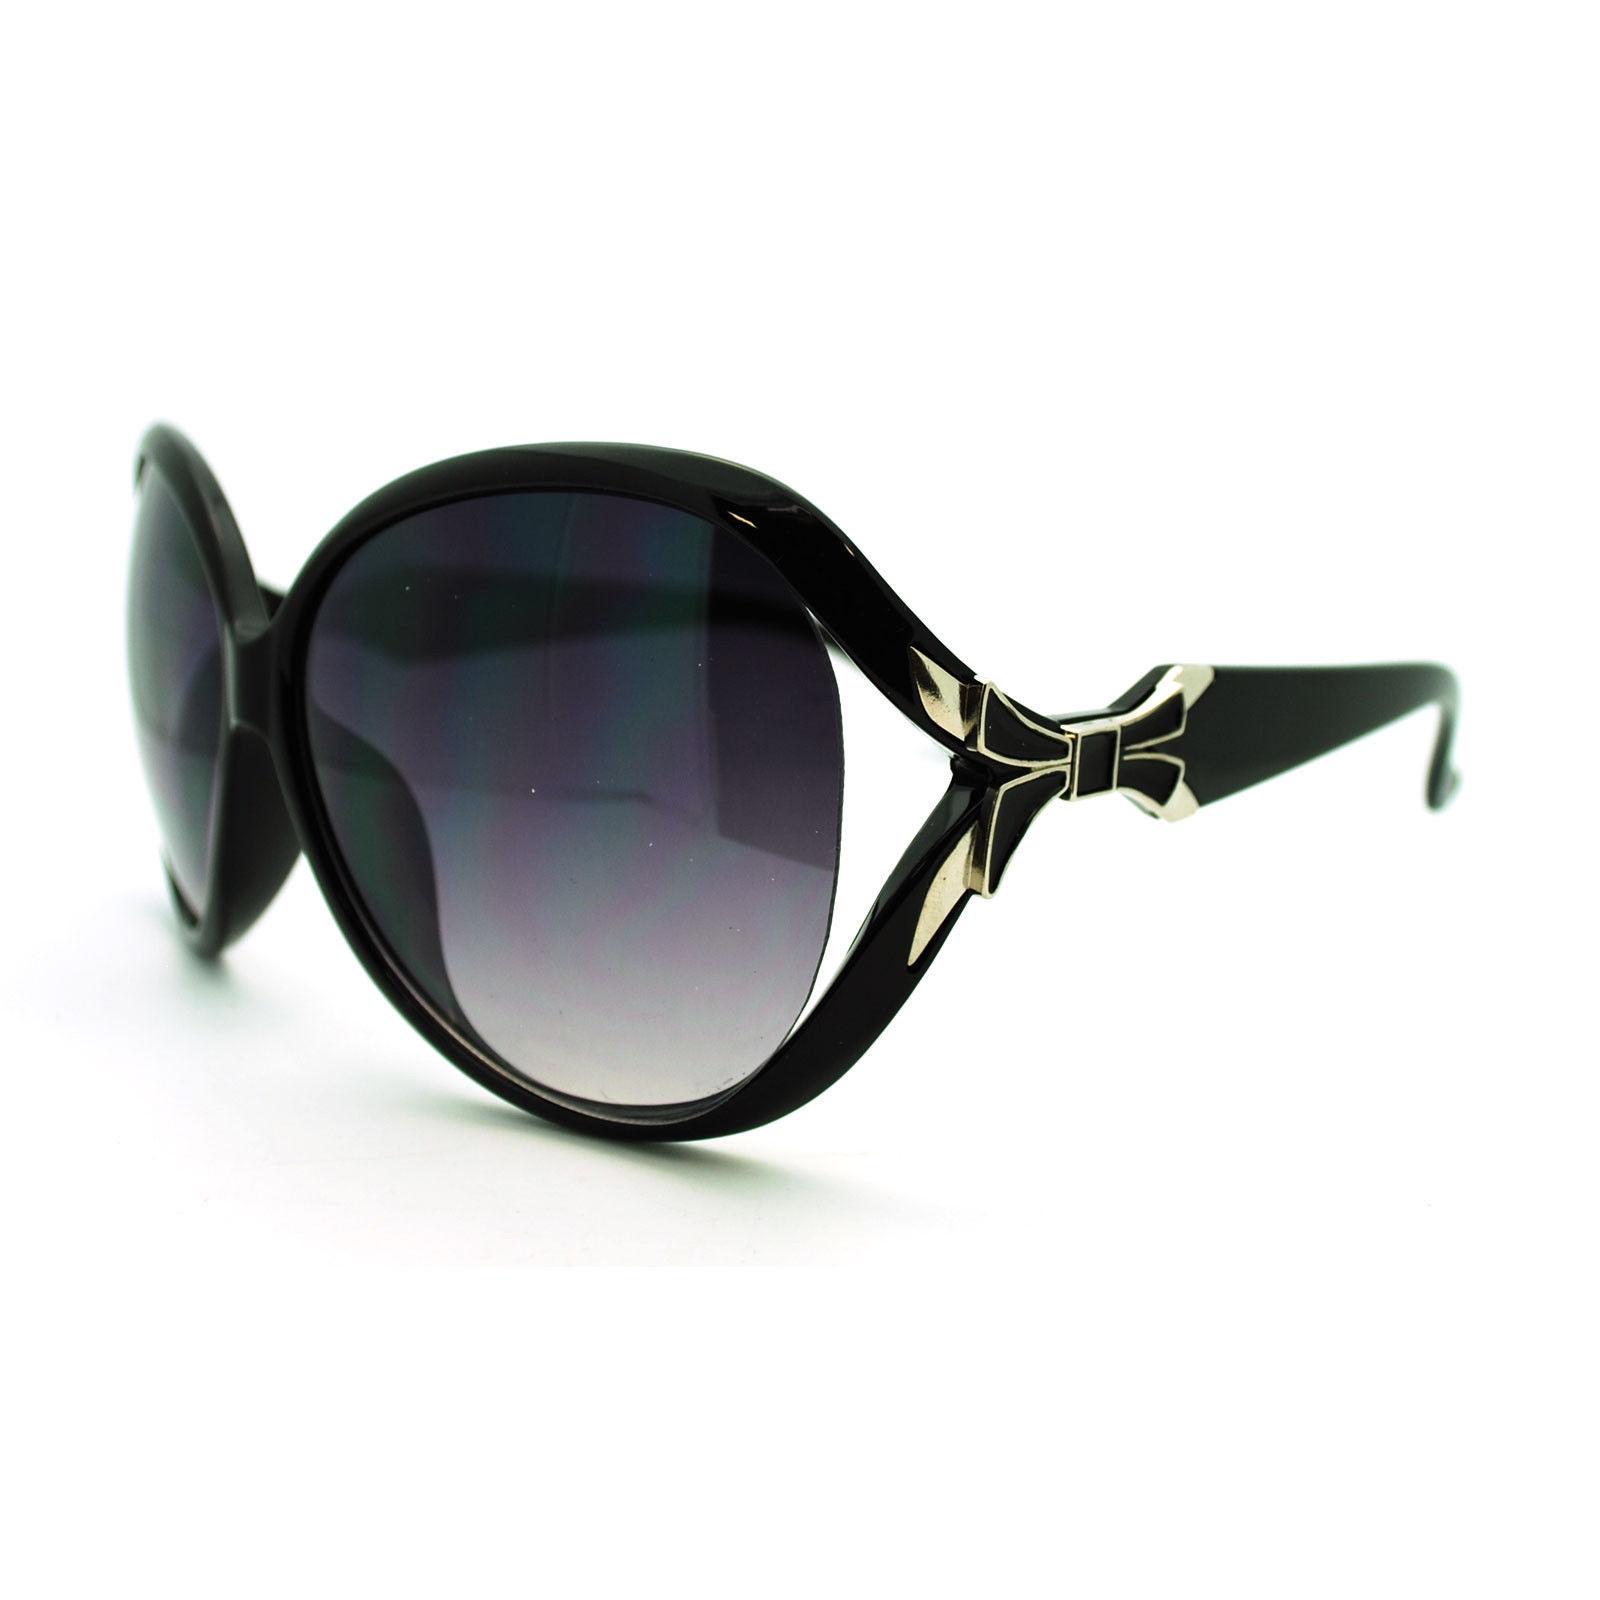 b4dda44490df S l1600. S l1600. Previous. Womens Butterfly Oversized Ribbon Emblem  European Designer Fashion Sunglasses